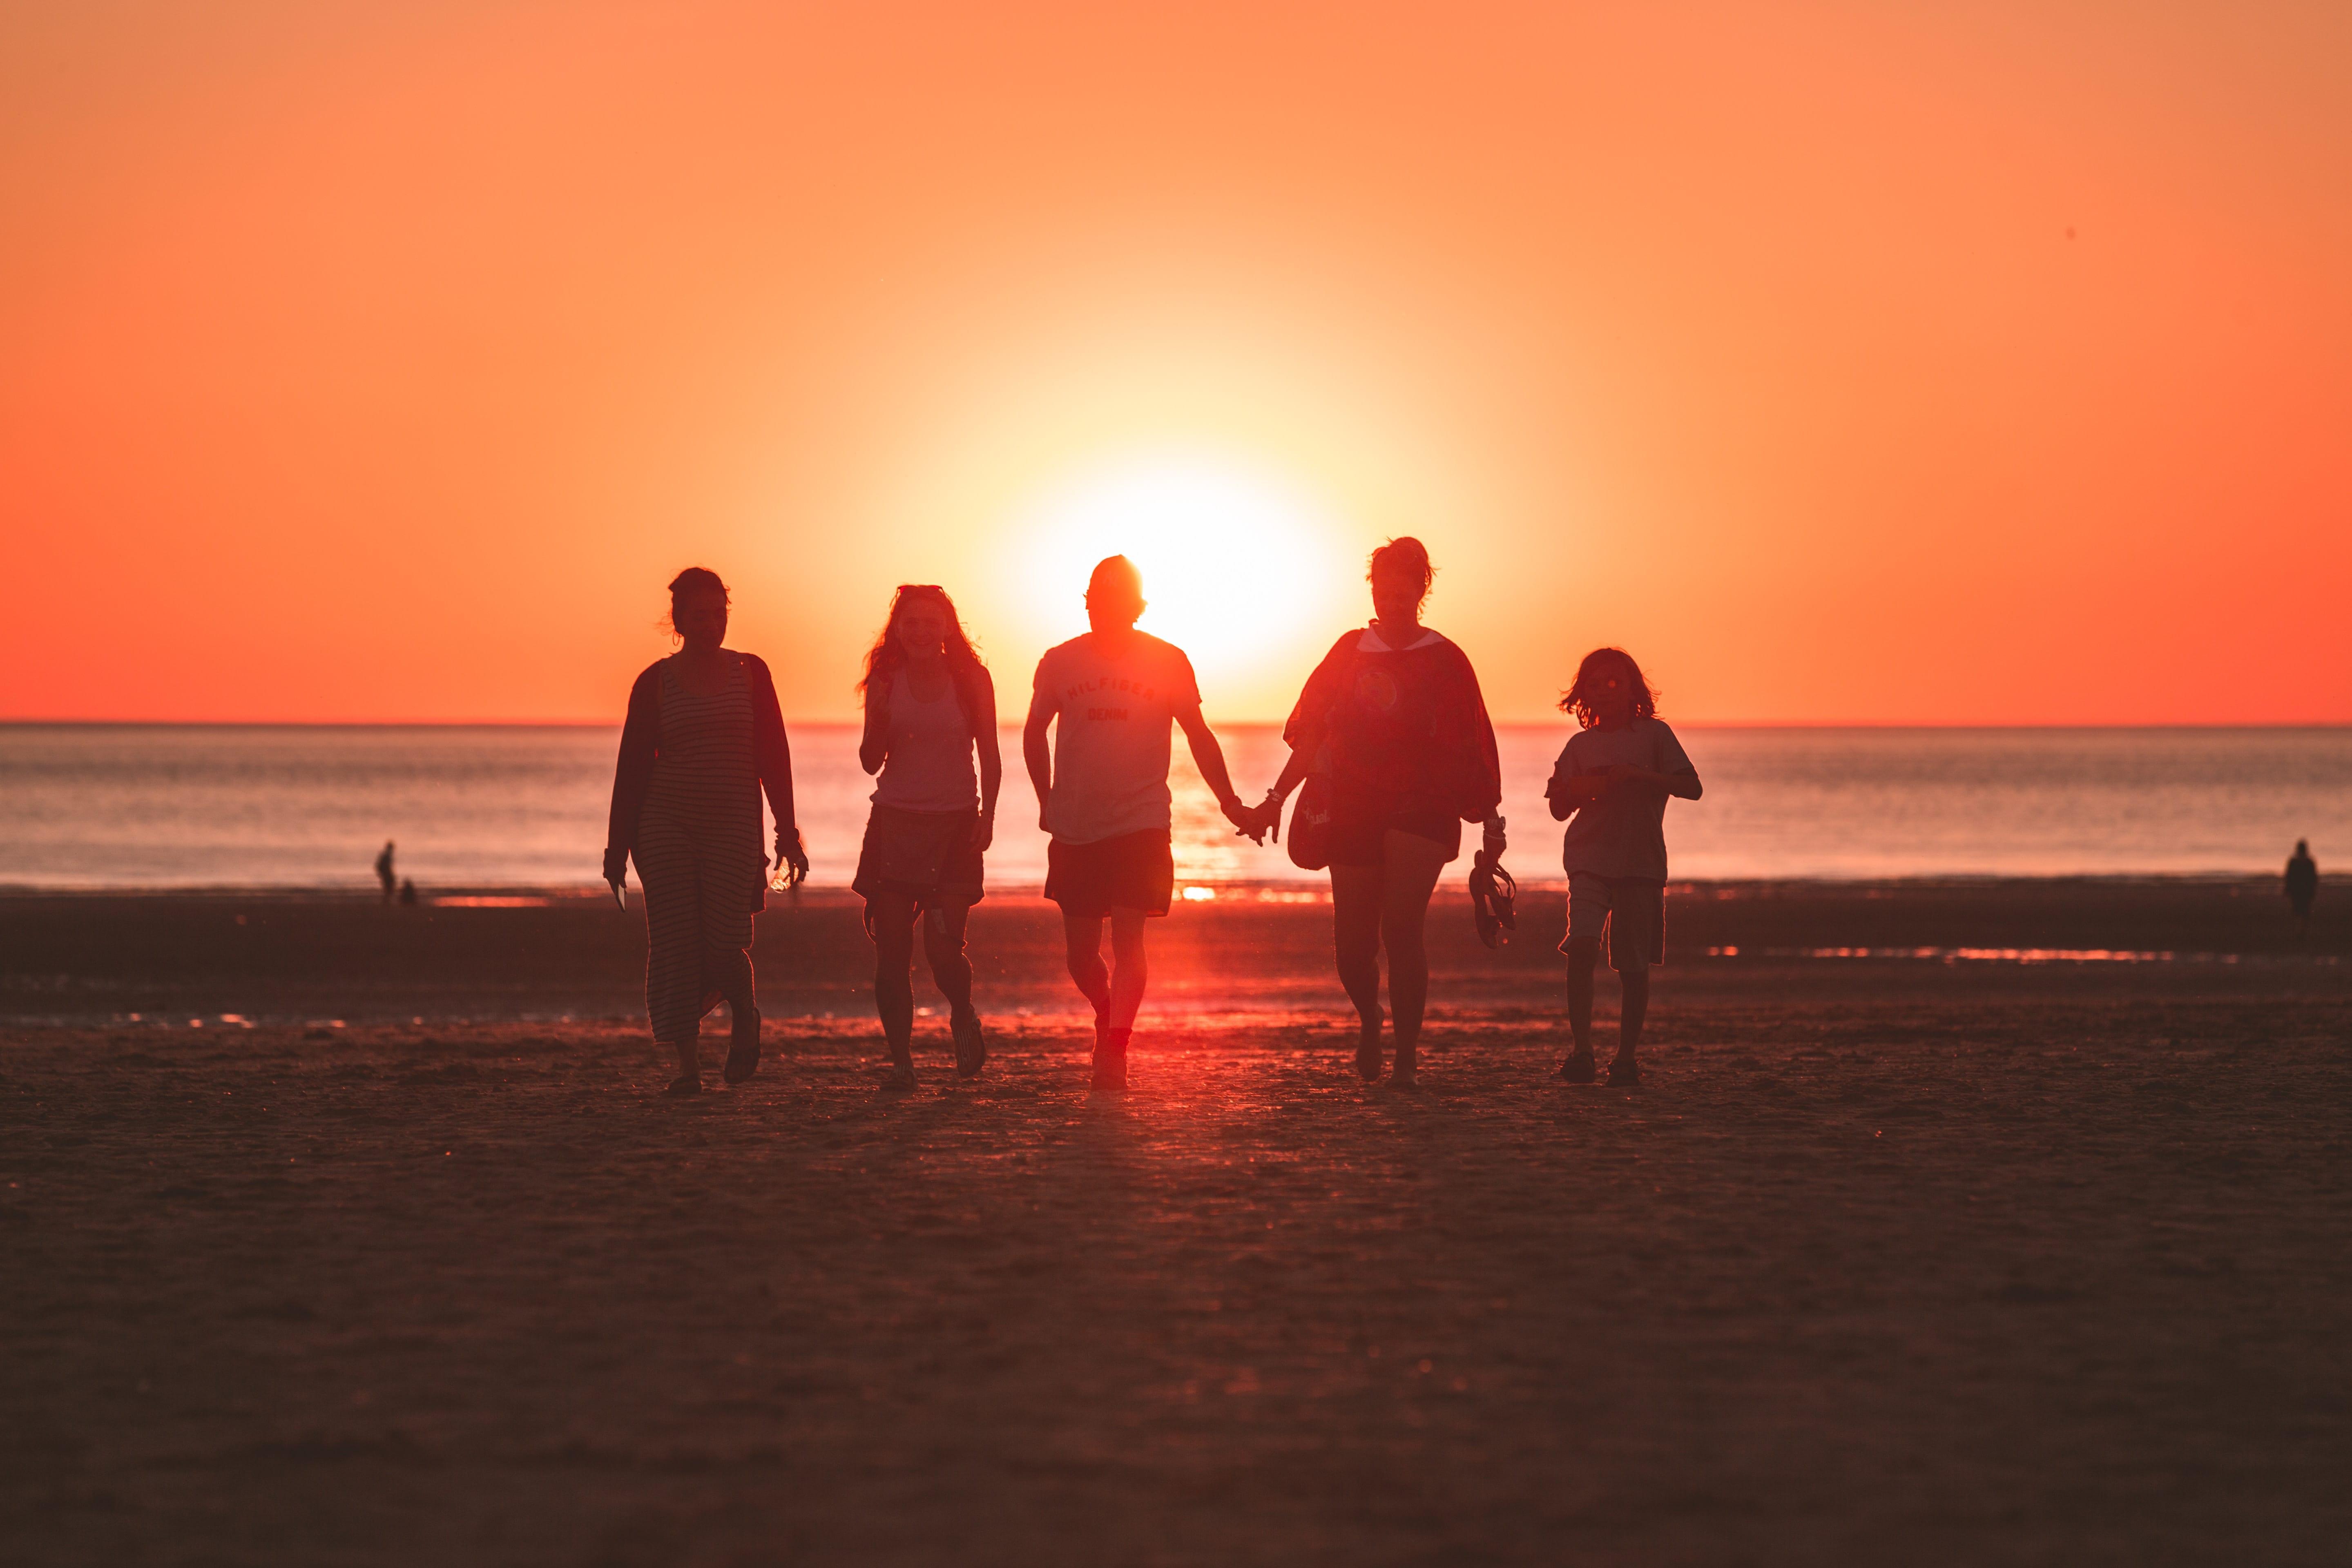 Family of five walking along beach at sunset; image by Kevin Delvecchio, via Unsplash.com.